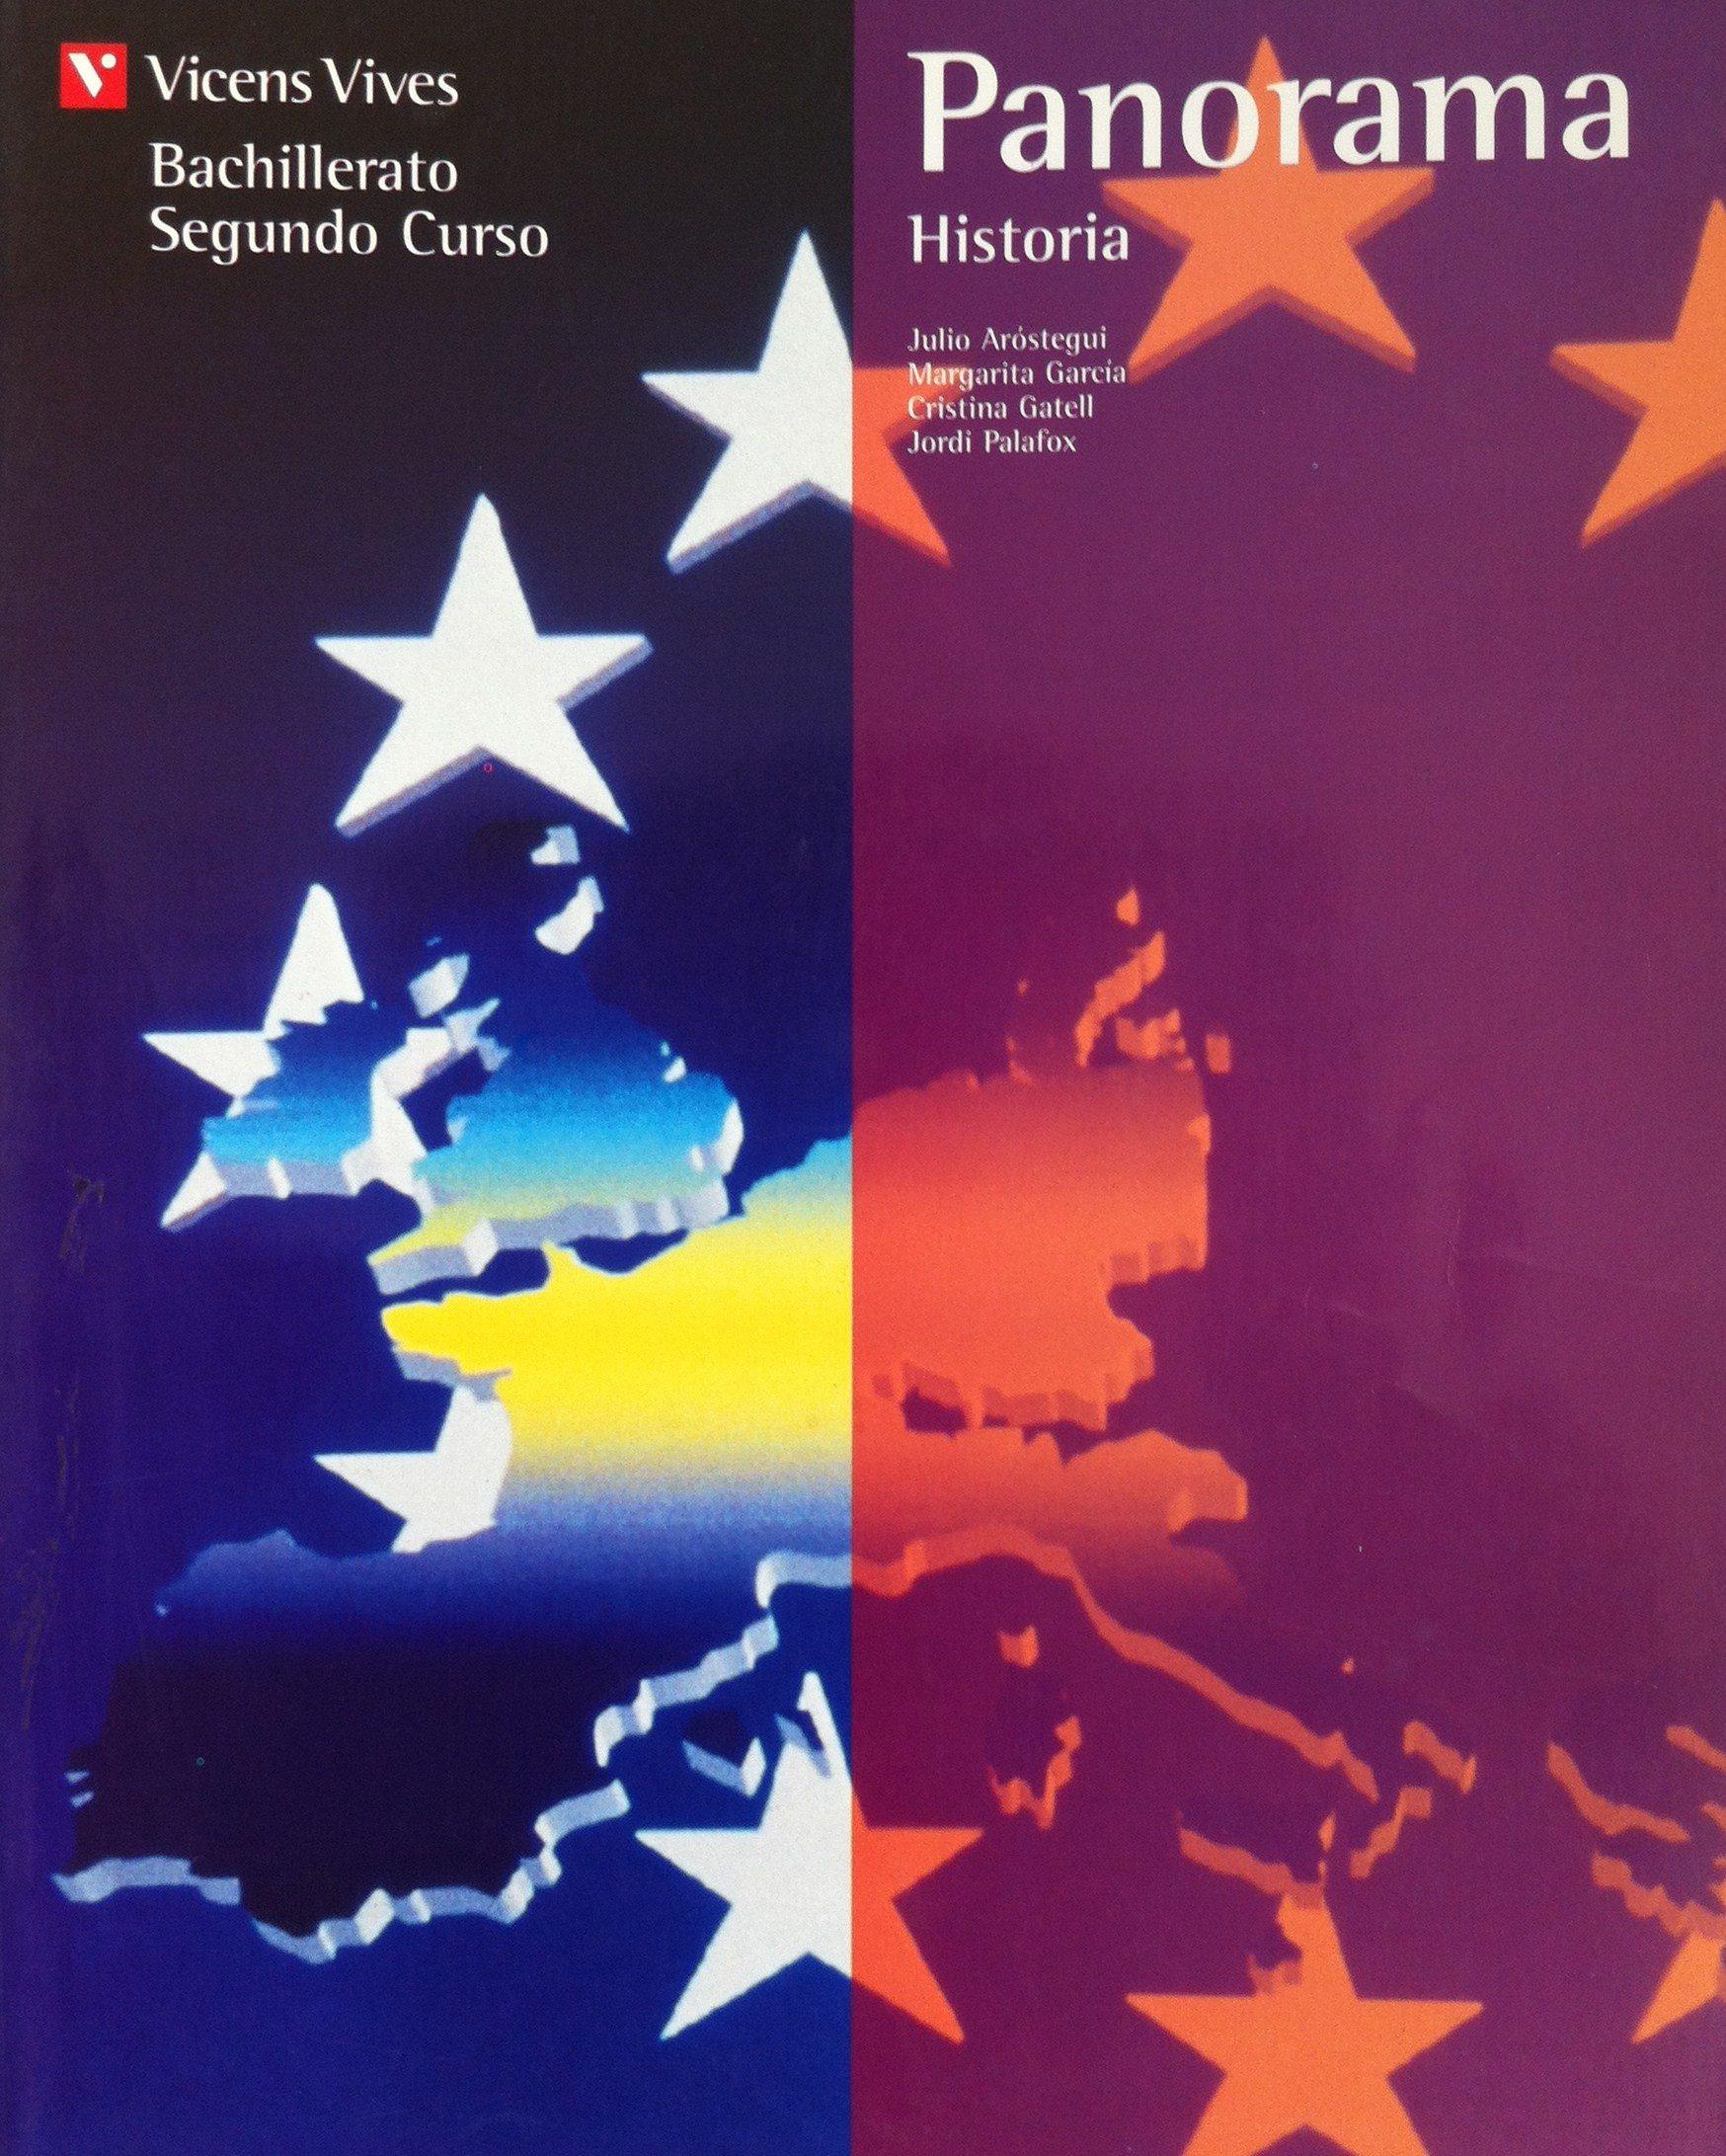 Panorama: hª España contemp. 2º bachillerato: Amazon.es: Arostegui Sanchez, Julio/Garcia Sebastian, Margarita/y otros/Gatell Arimont, Cristina: Libros